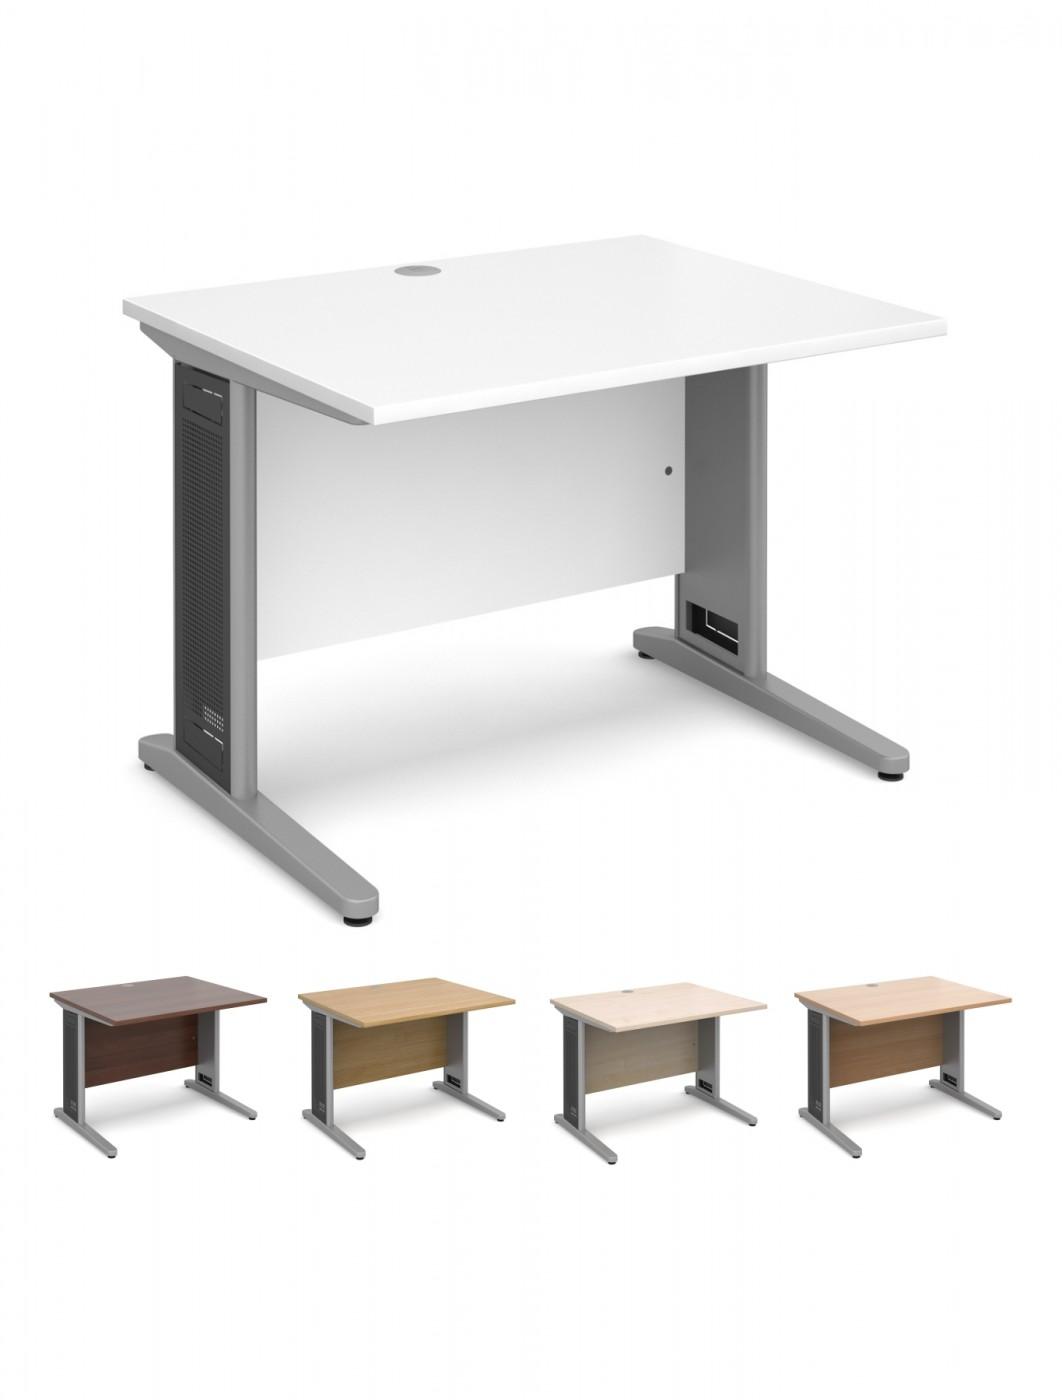 Office Desks   Largo 1000mm Wide Straight Office Desk L10   Enlarged View